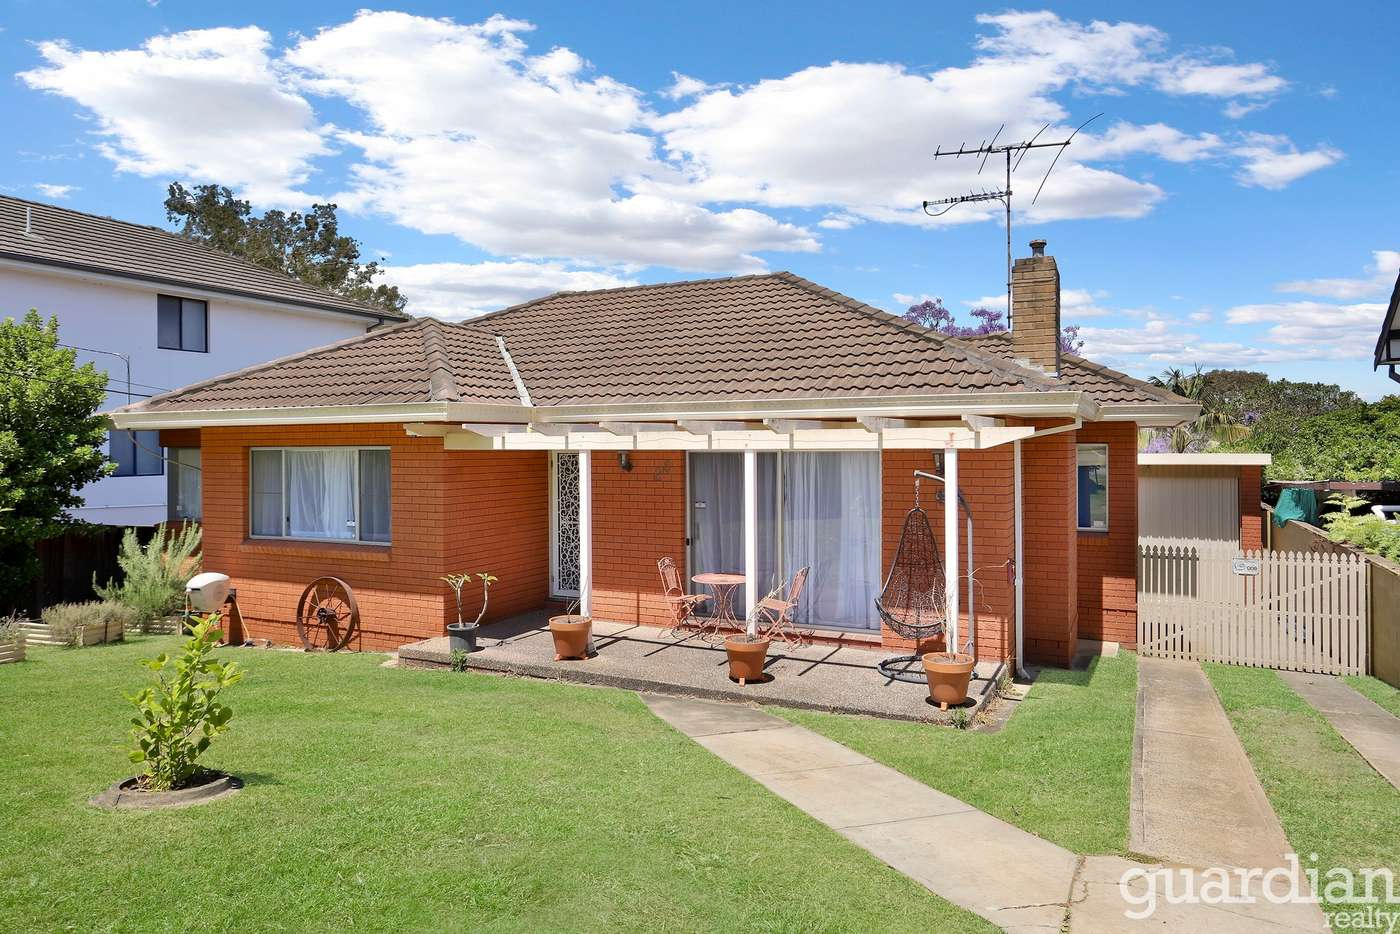 Main view of Homely house listing, 26 Cross Street, Baulkham Hills NSW 2153